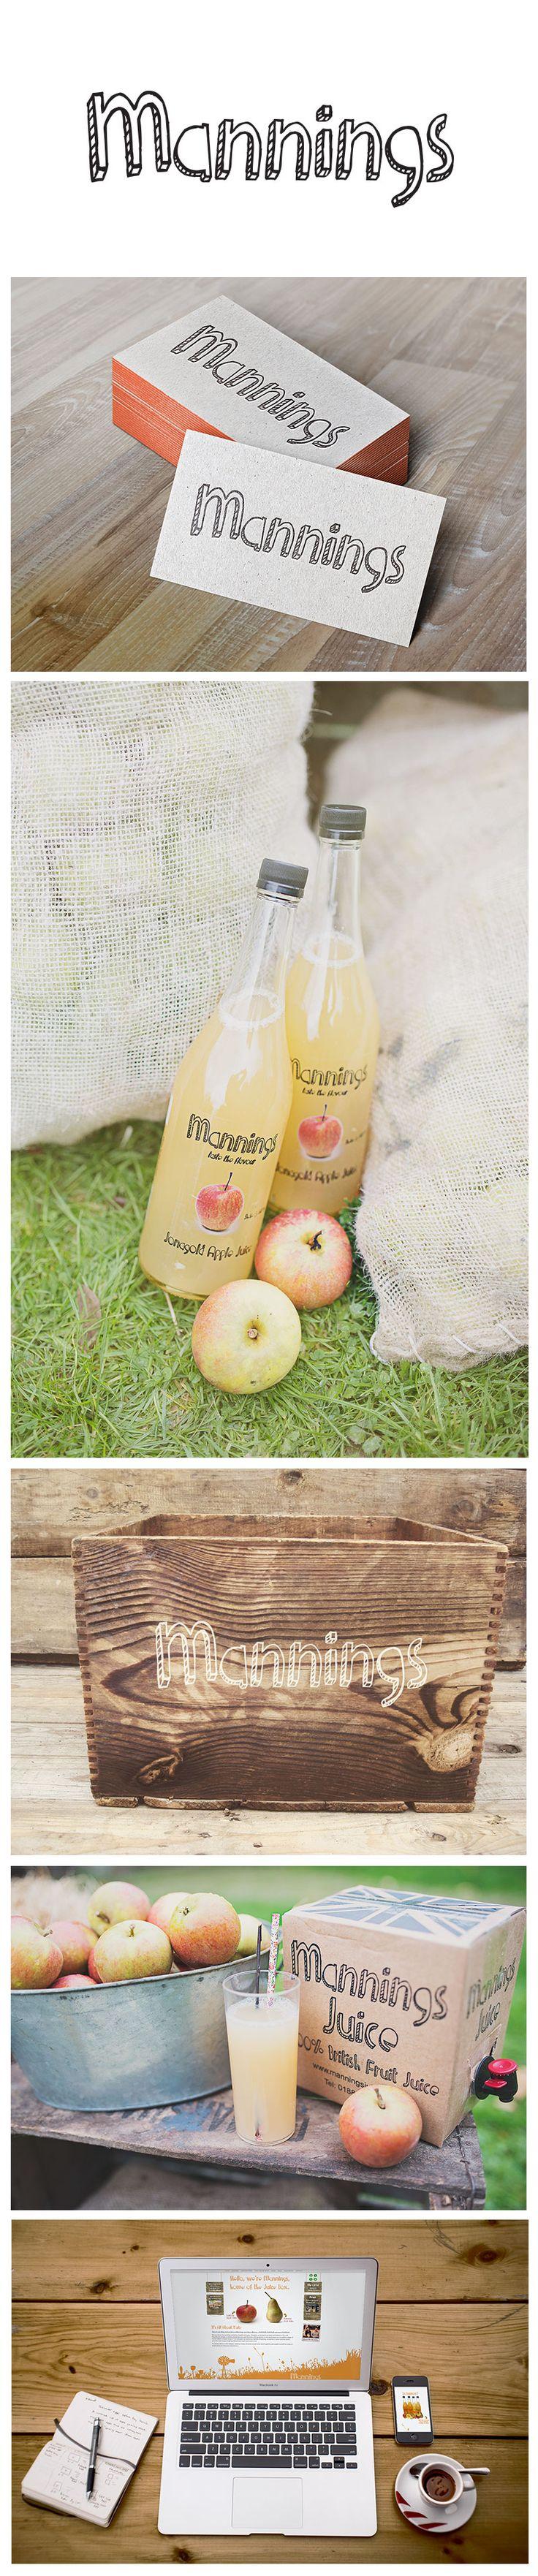 Orphans Press #Branding work for Mannings Juice from #Herefordshire www.manningsjuice.co.uk   #Print #Webdesign